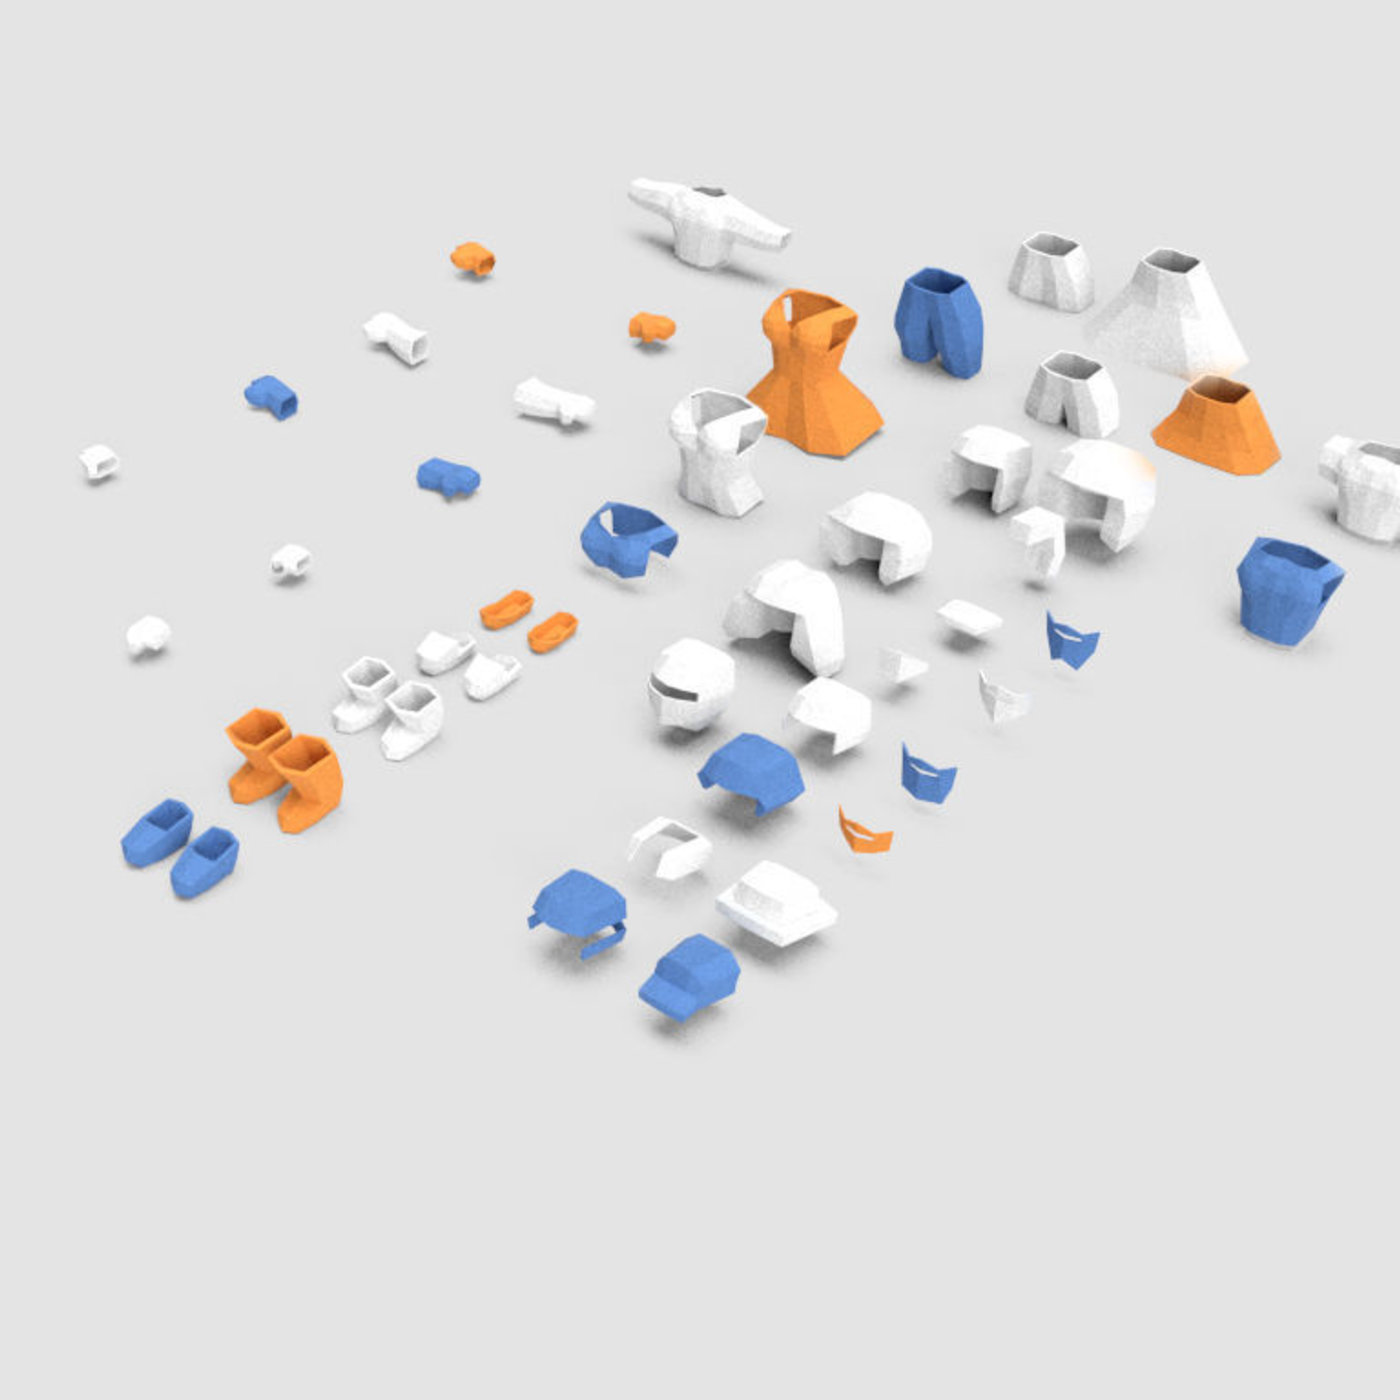 origami character kit